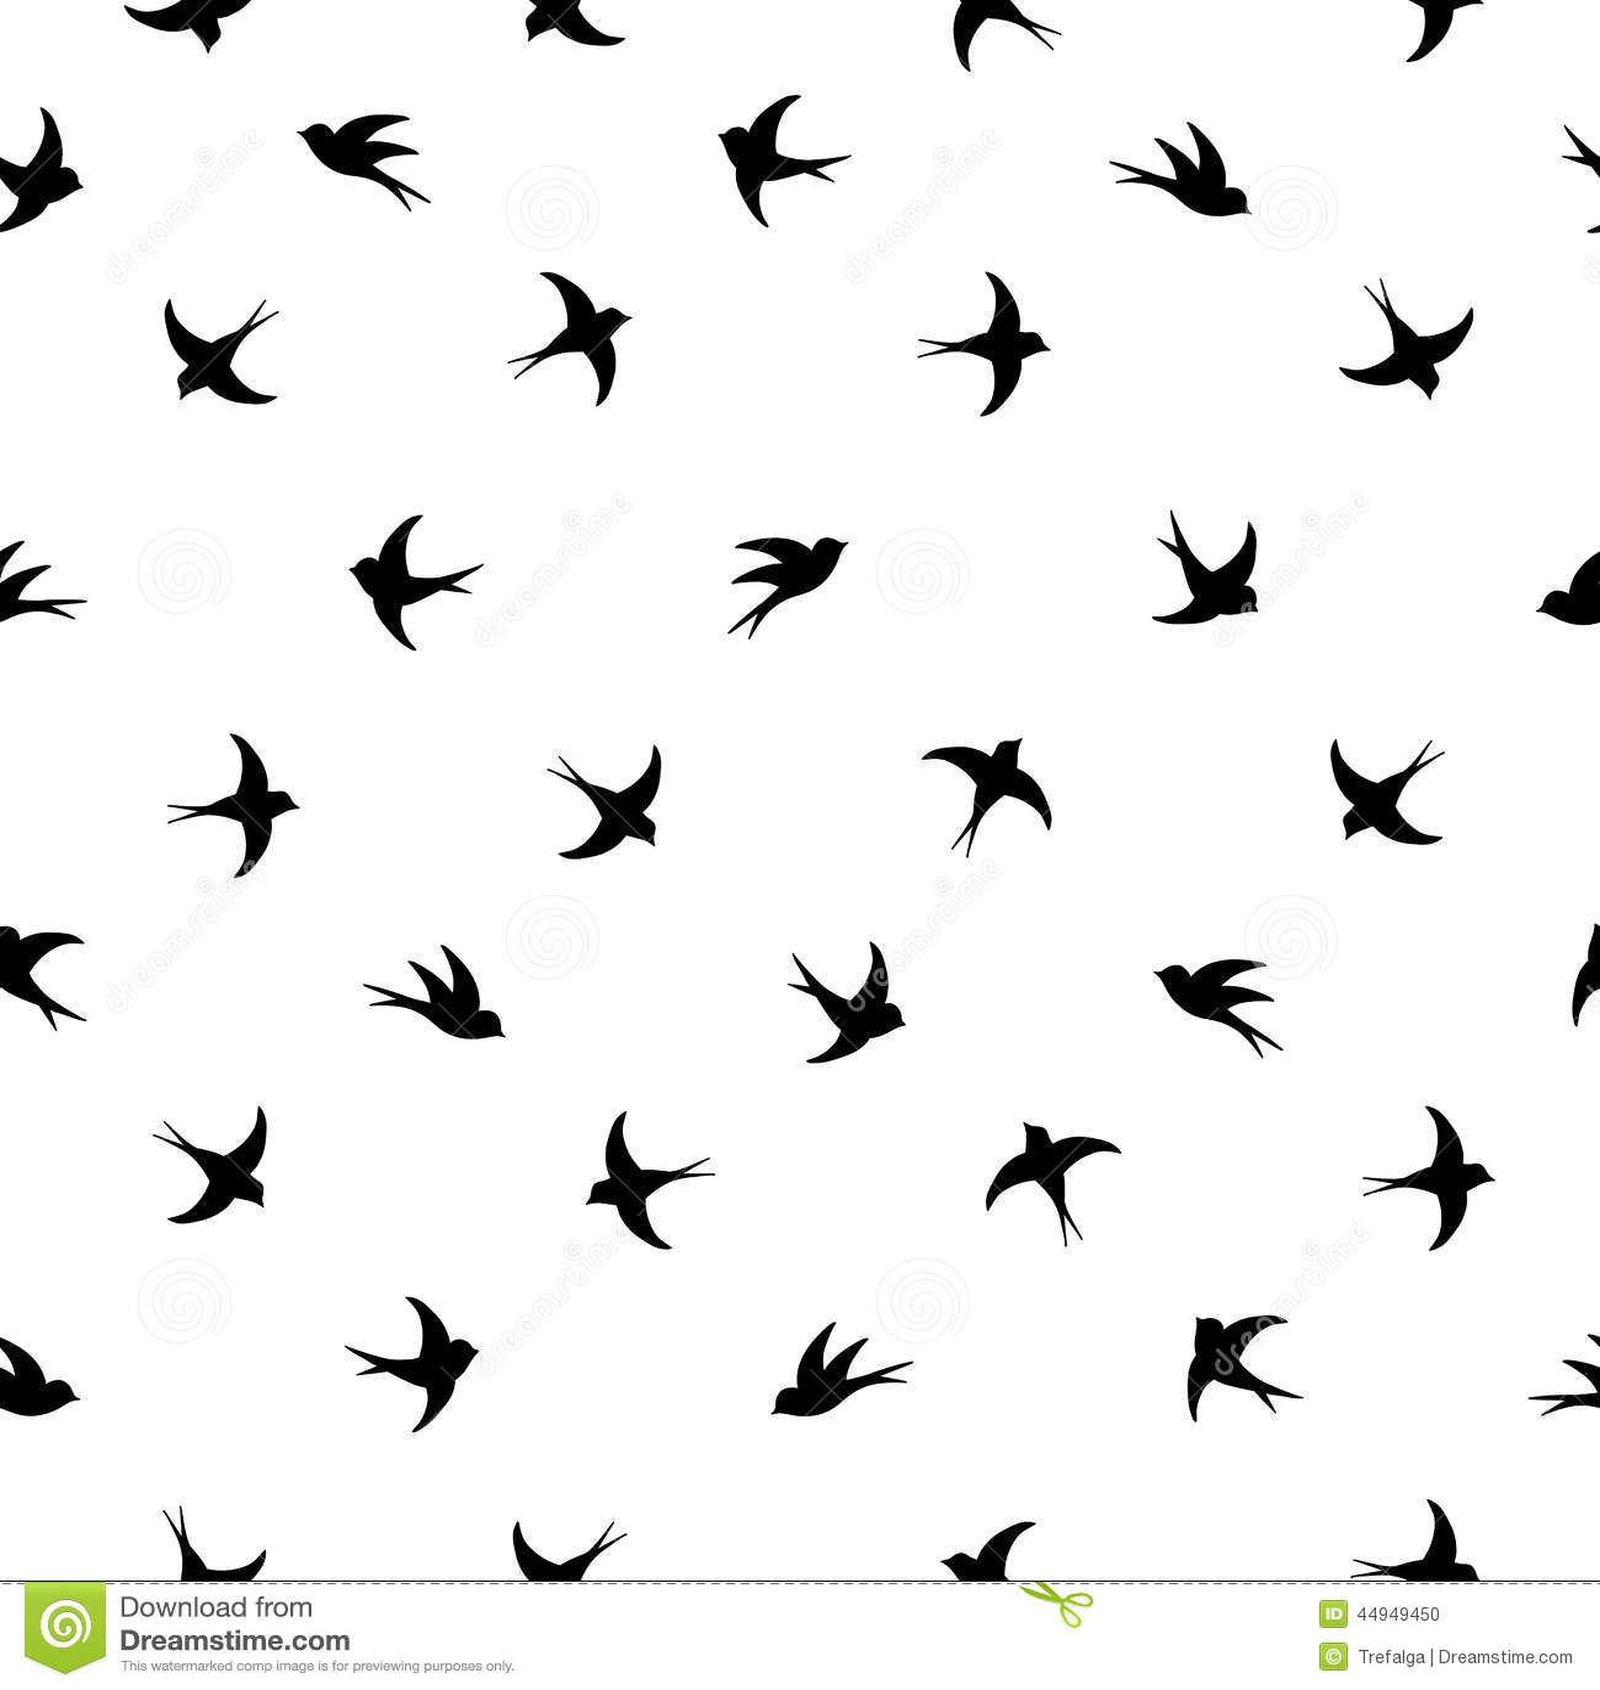 flying birds silhouette pattern stock vector illustration of